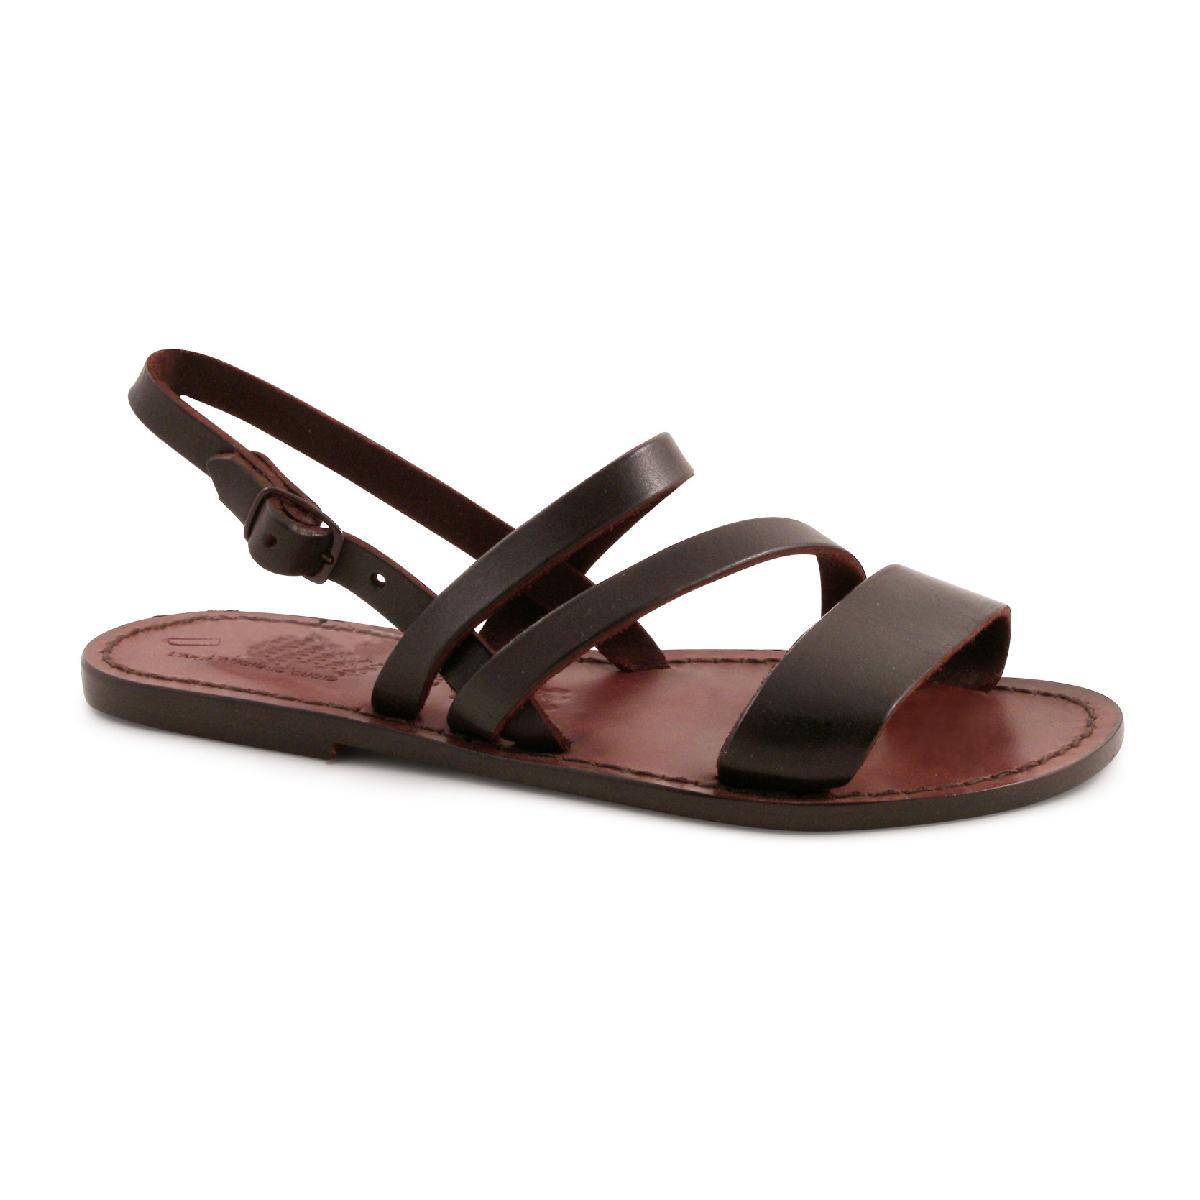 flache sandalen f r damen aus dunkelbraunem leder. Black Bedroom Furniture Sets. Home Design Ideas